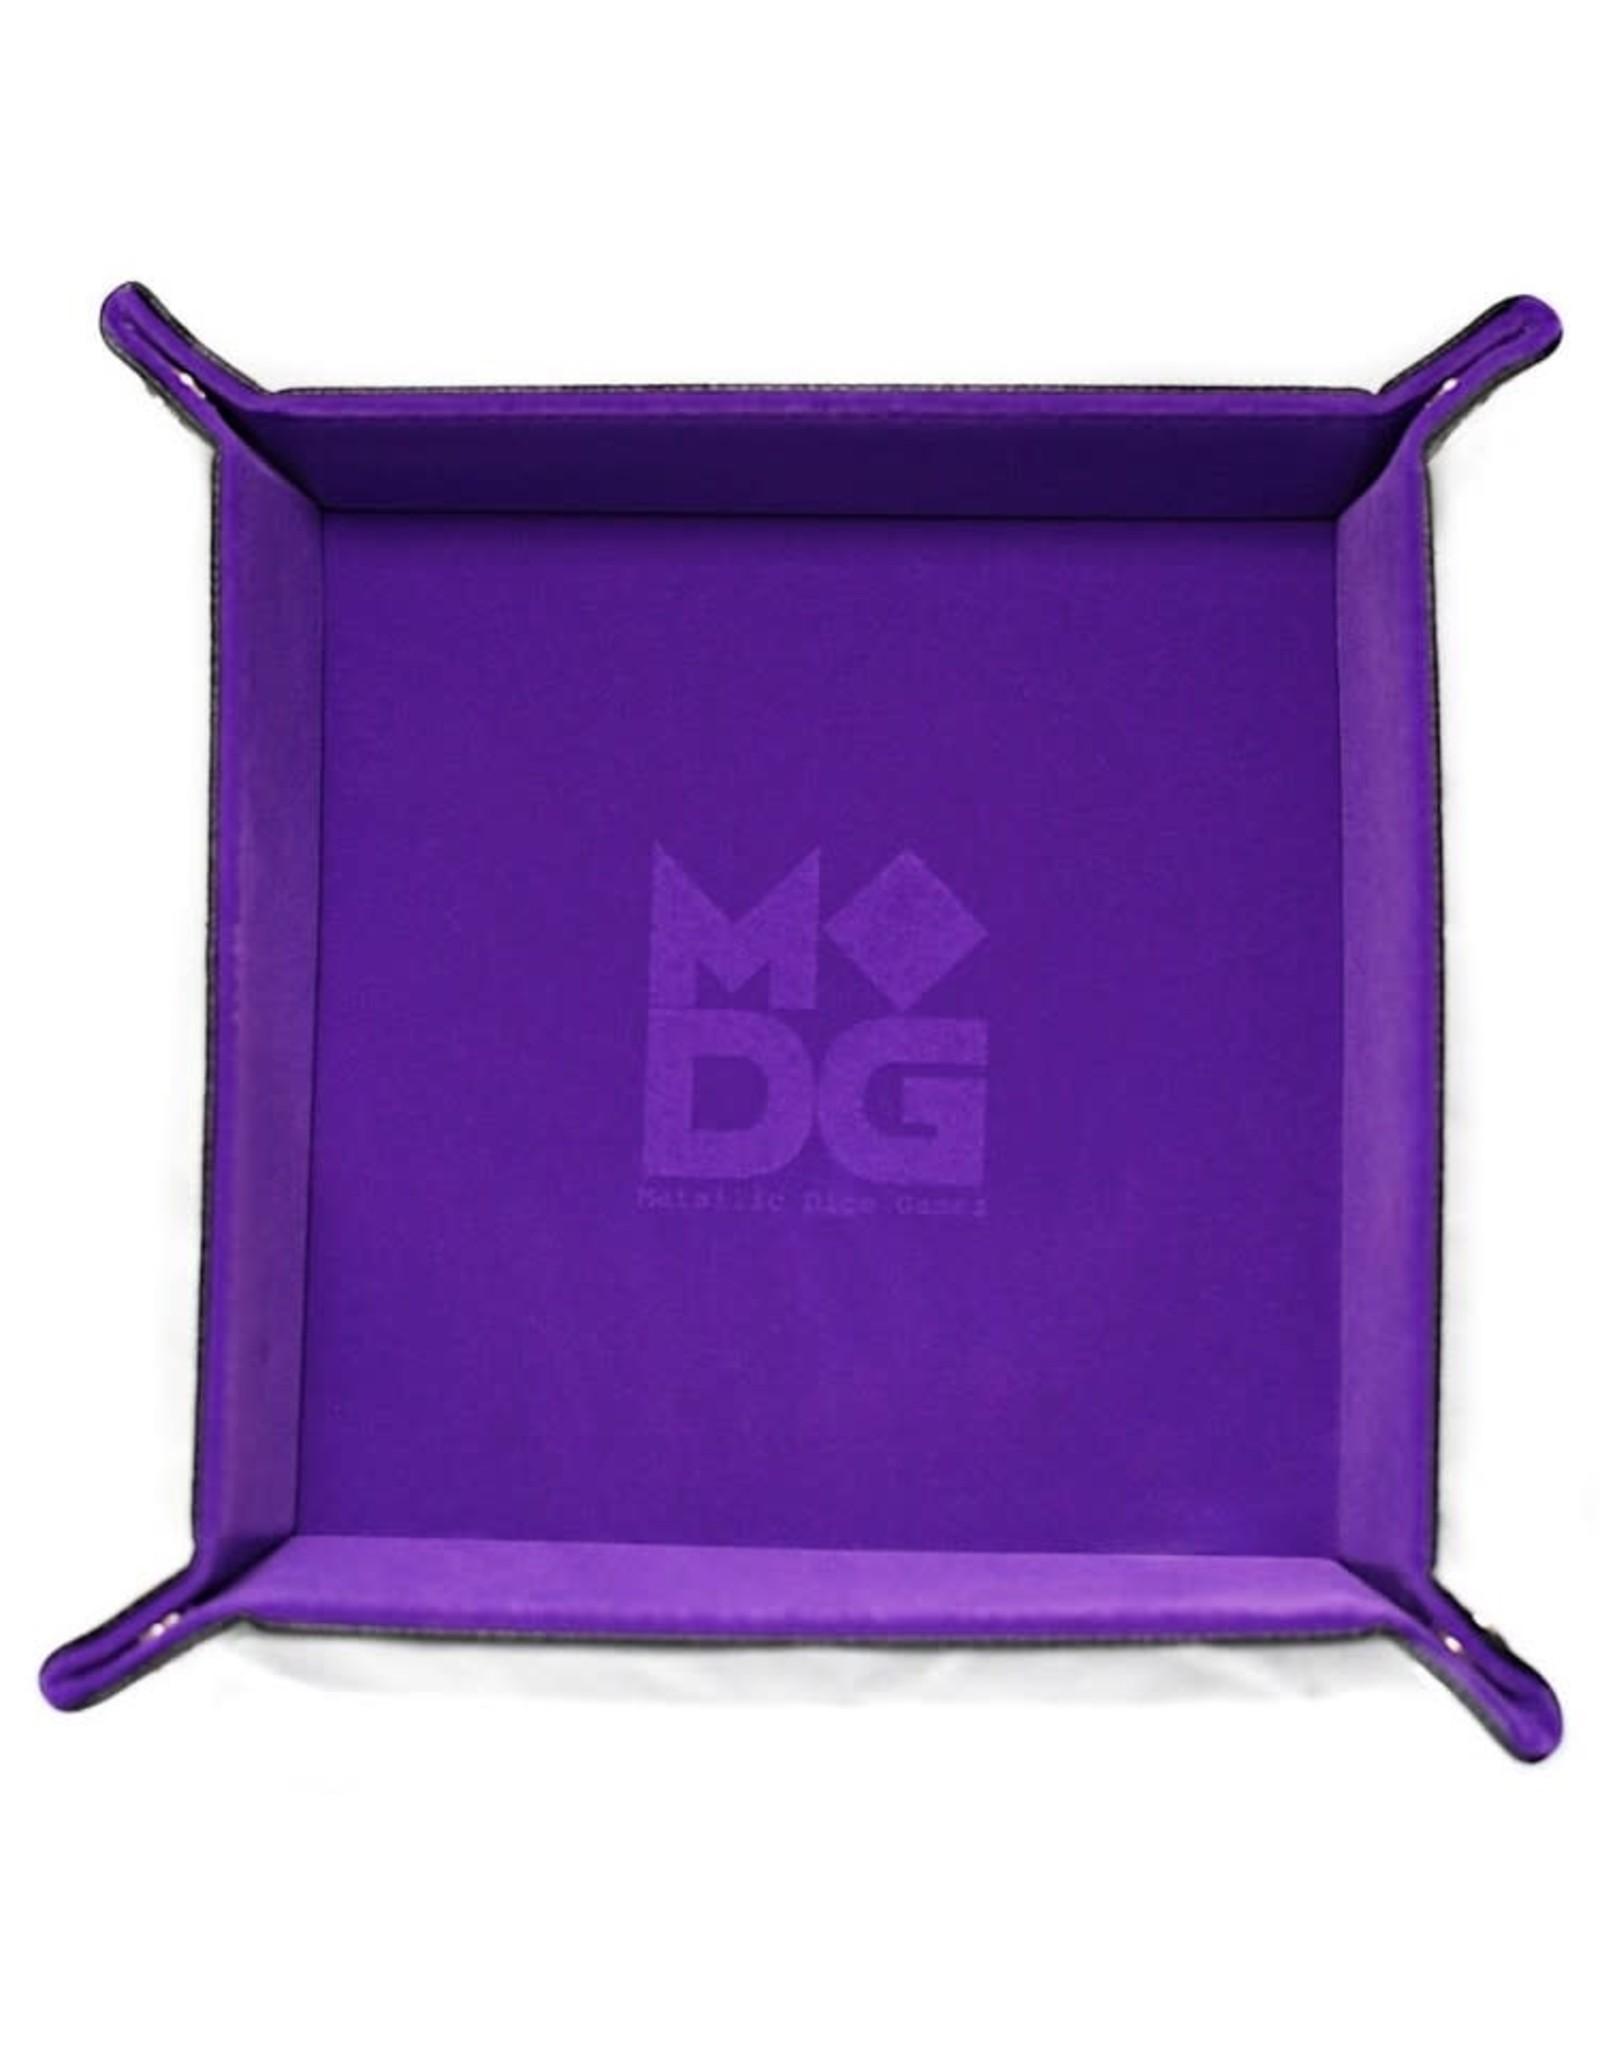 Metallic Dice Games Folding Dice Tray: Velvet 10x10 PU